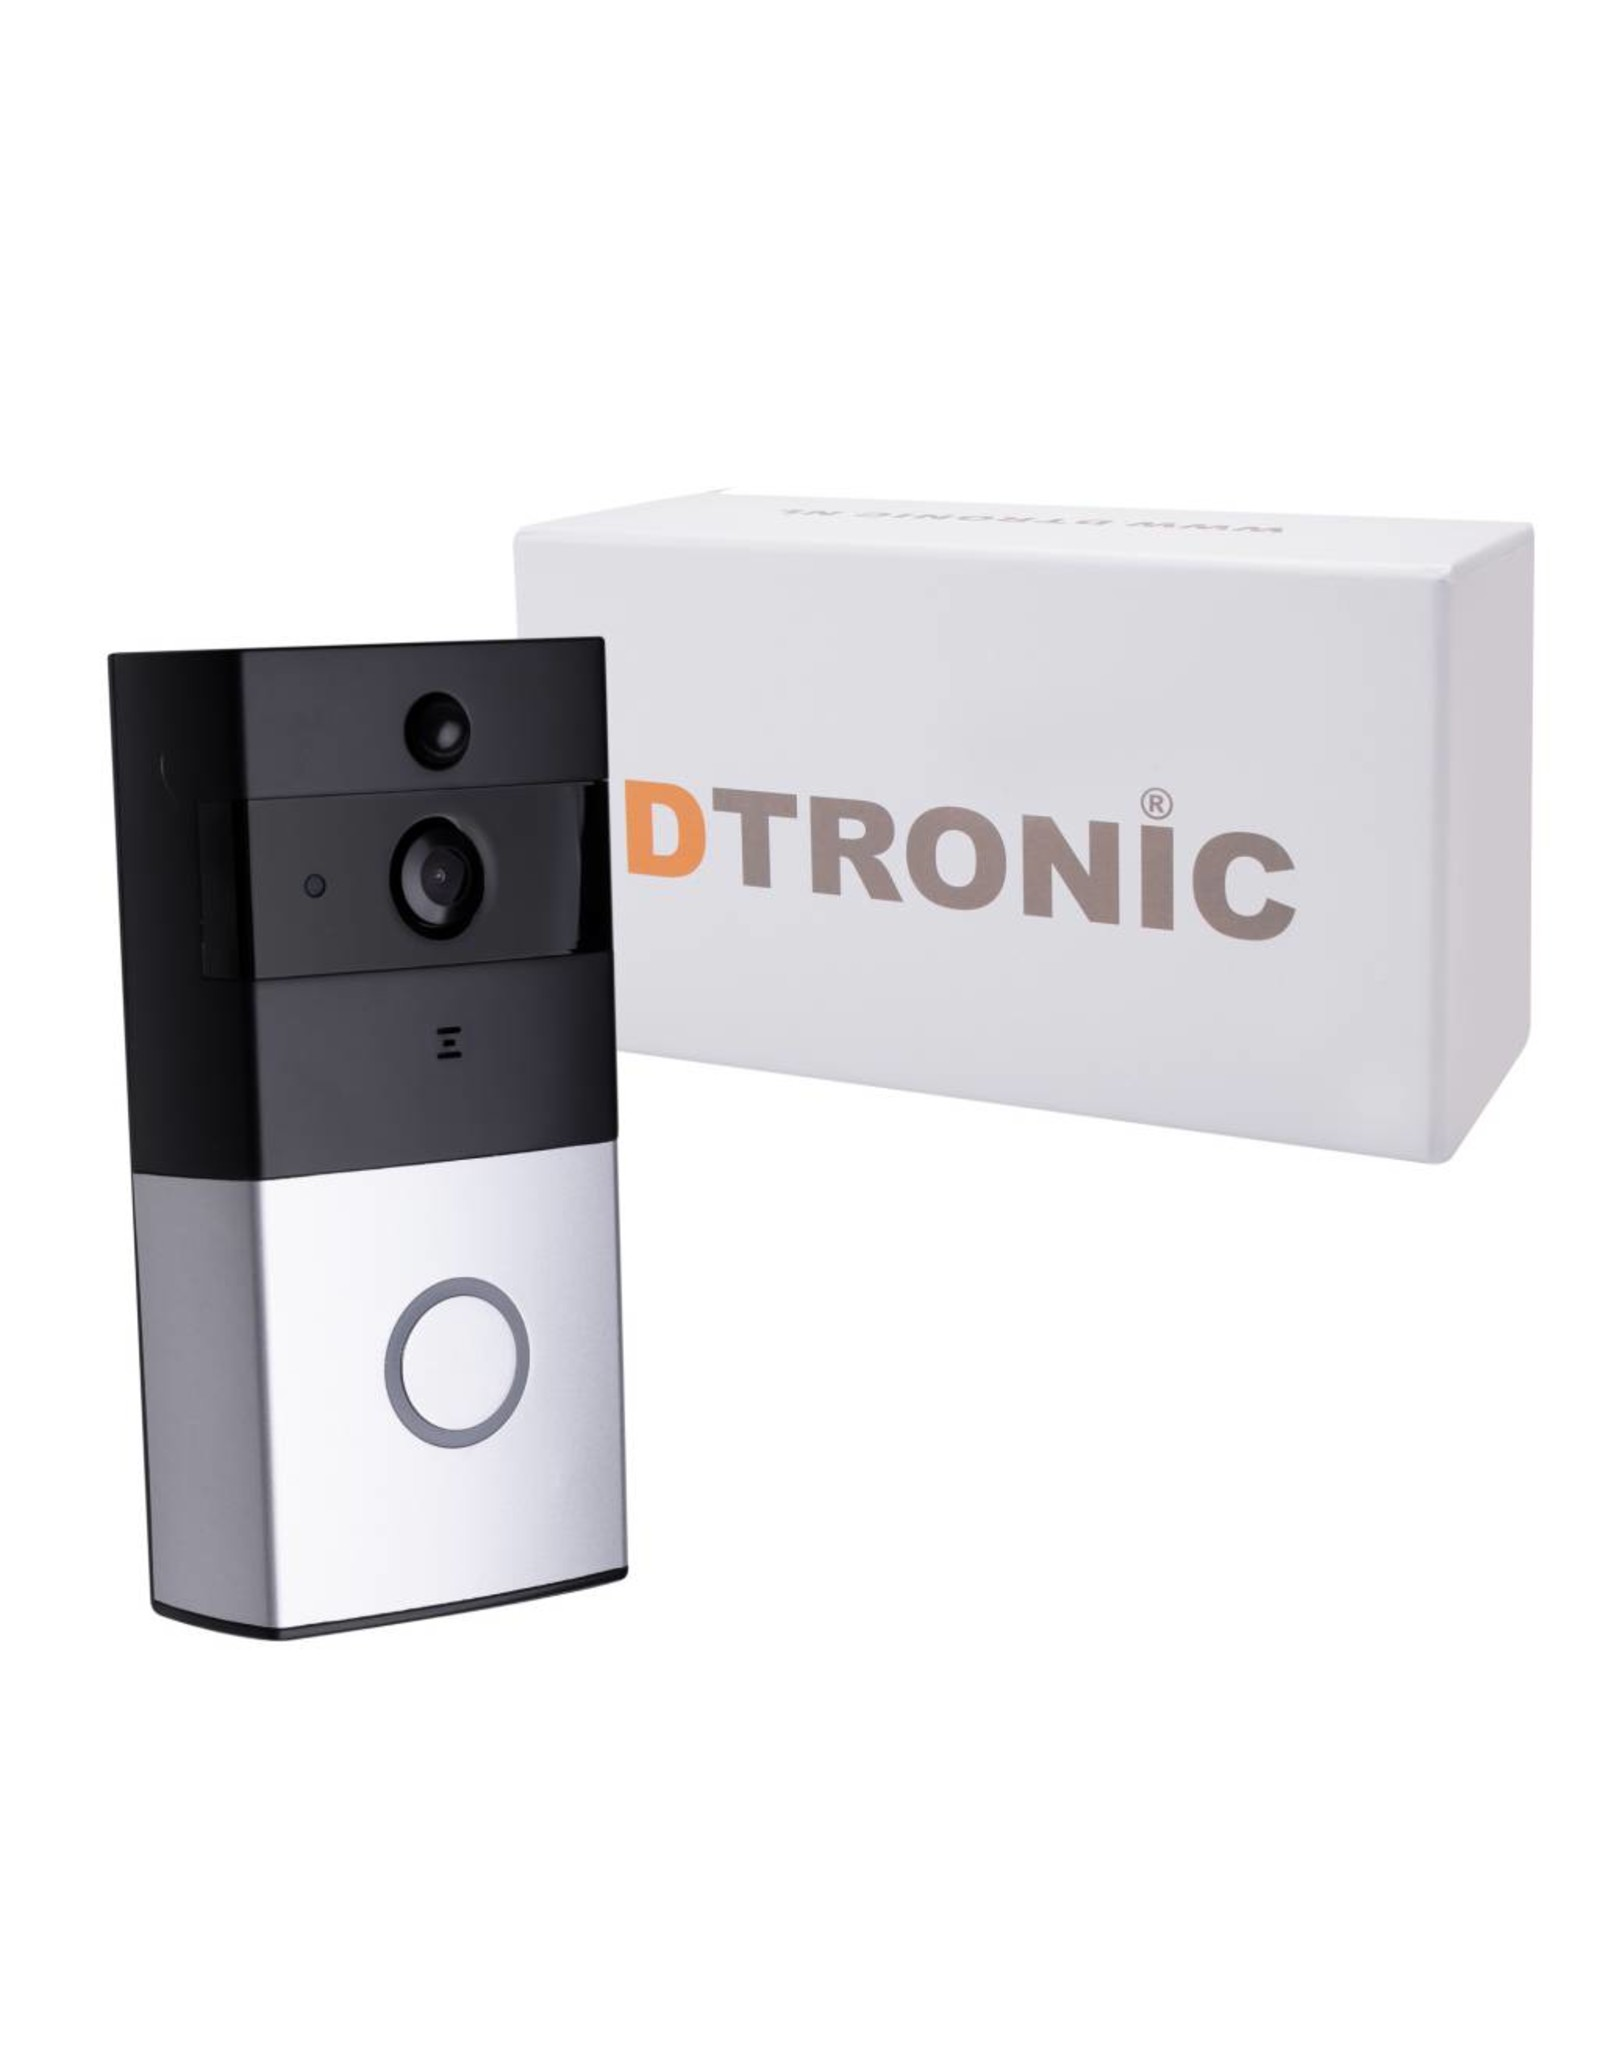 DTRONIC DTRONIC - M1